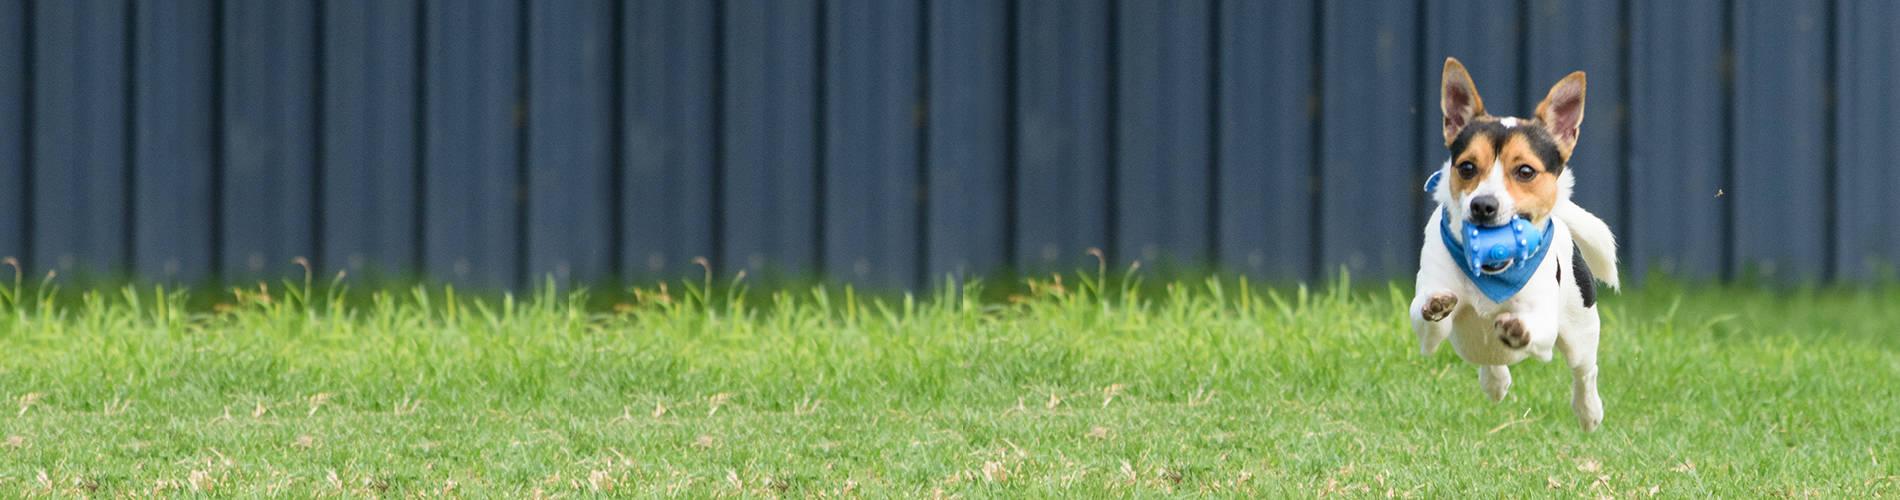 Dogs - RSPCA South Australia